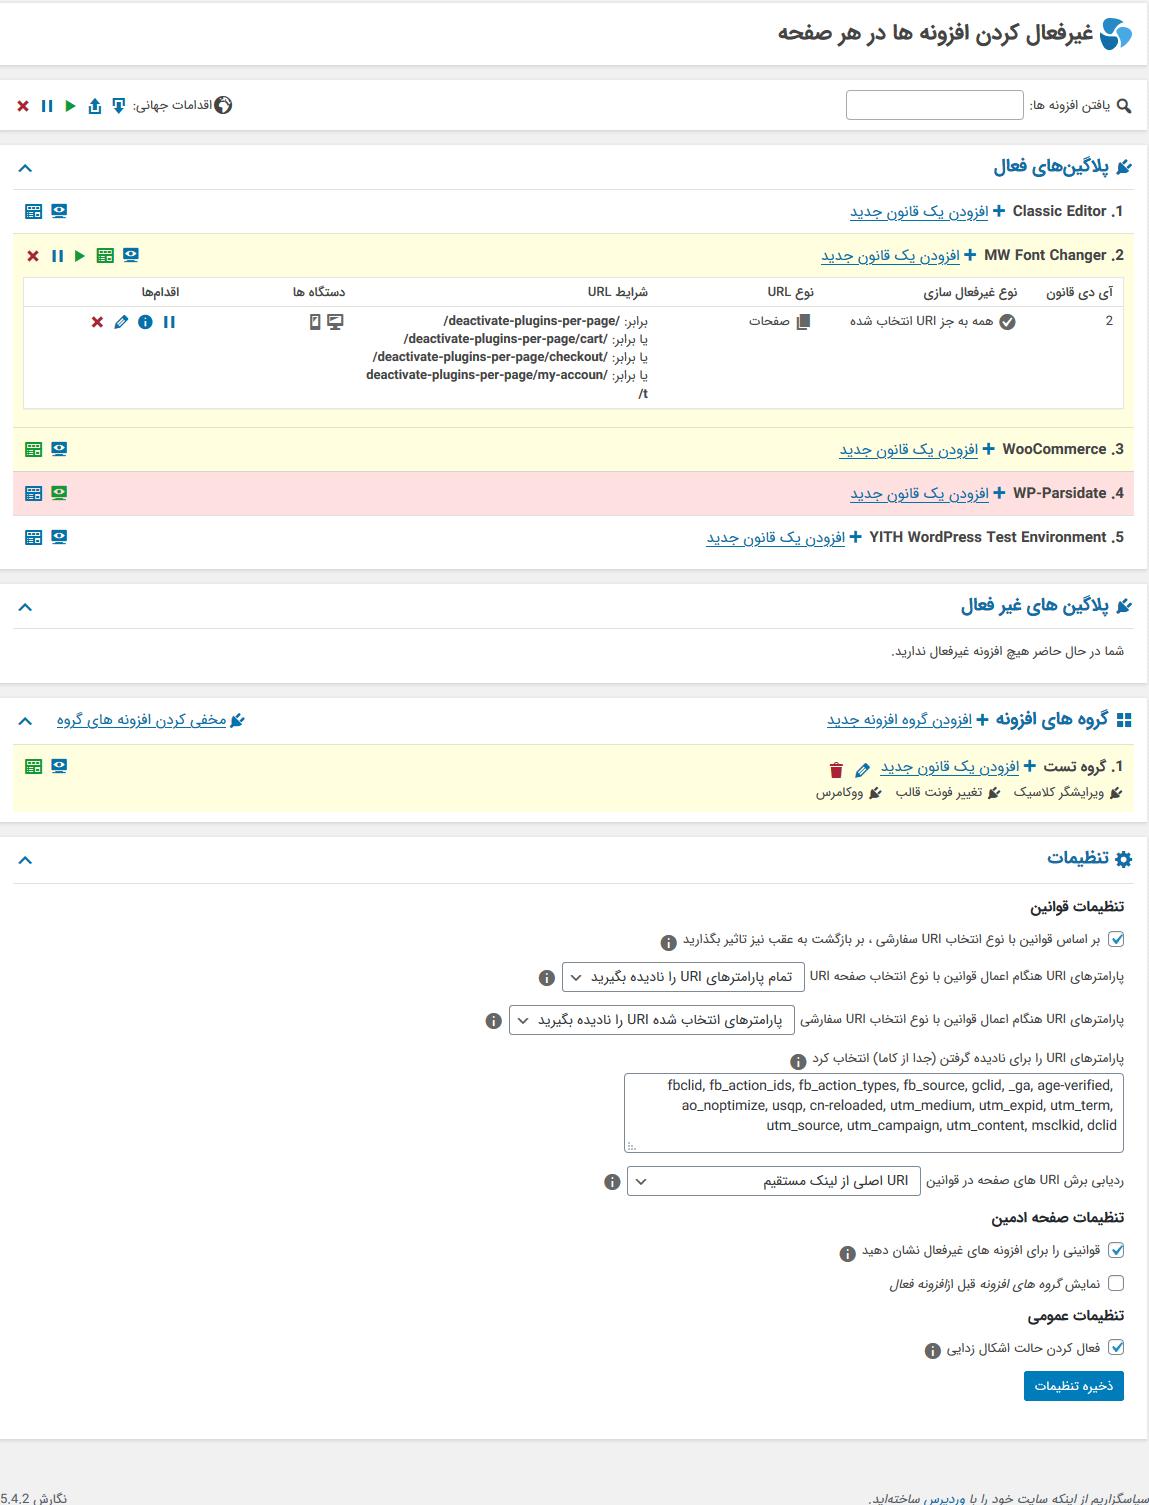 تنظیمات افزونه Deactivate Plugins Per Page